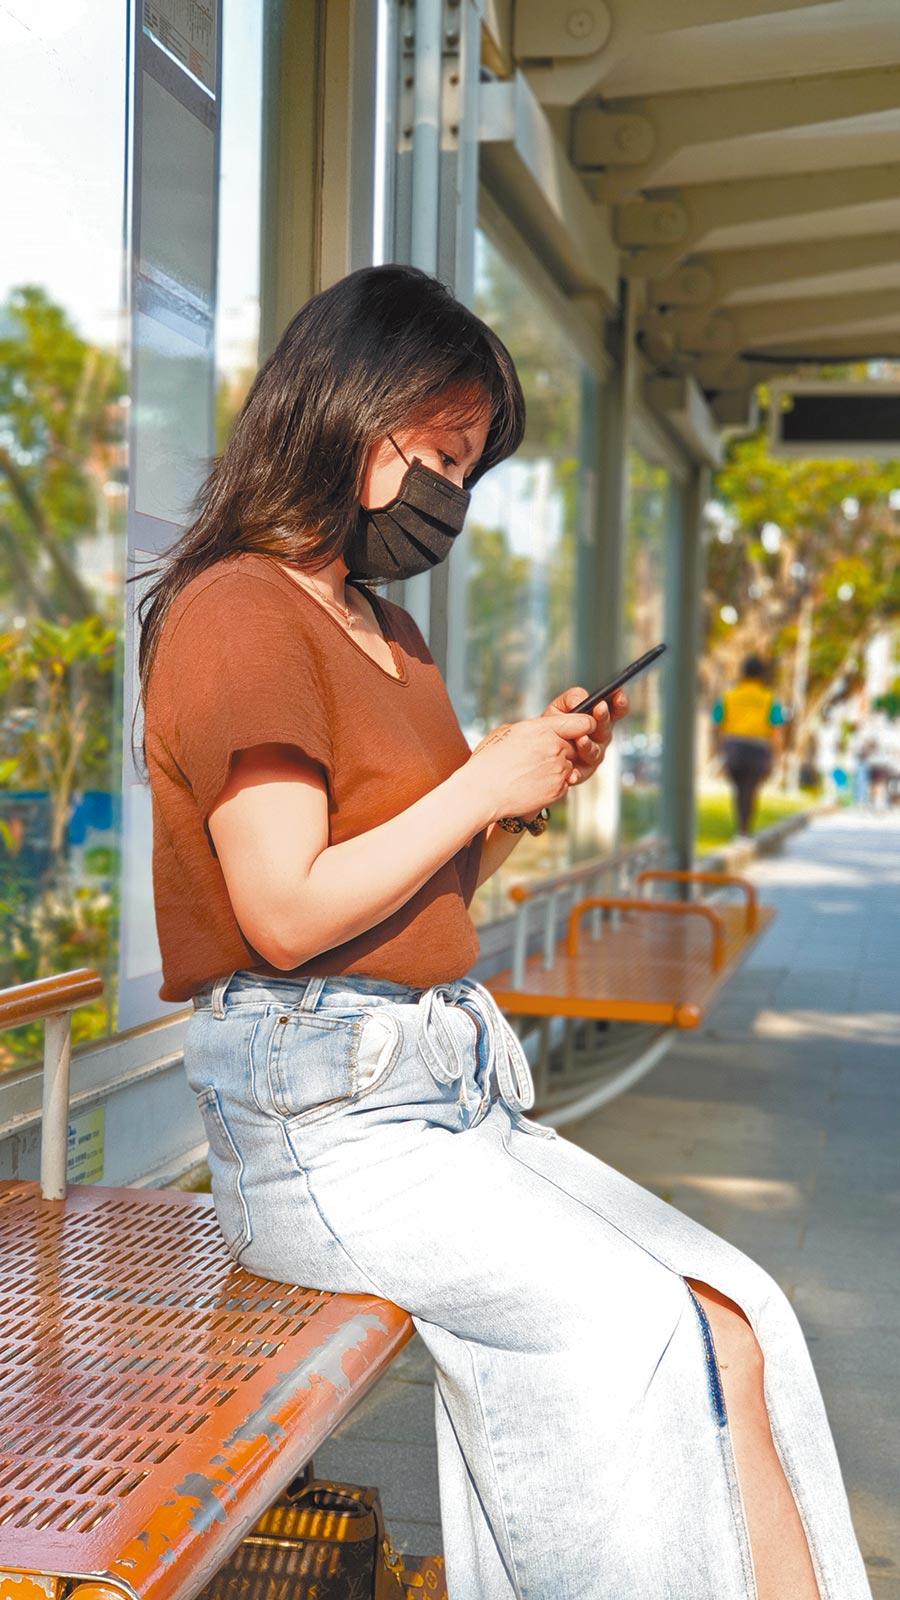 Jenny滯留武漢95天,返台後又集中隔離14天。她在台北街頭的公車亭等候公車時邊滑手機邊享受午後的陽光,對人生有了更深的體悟。(藍孝威攝)